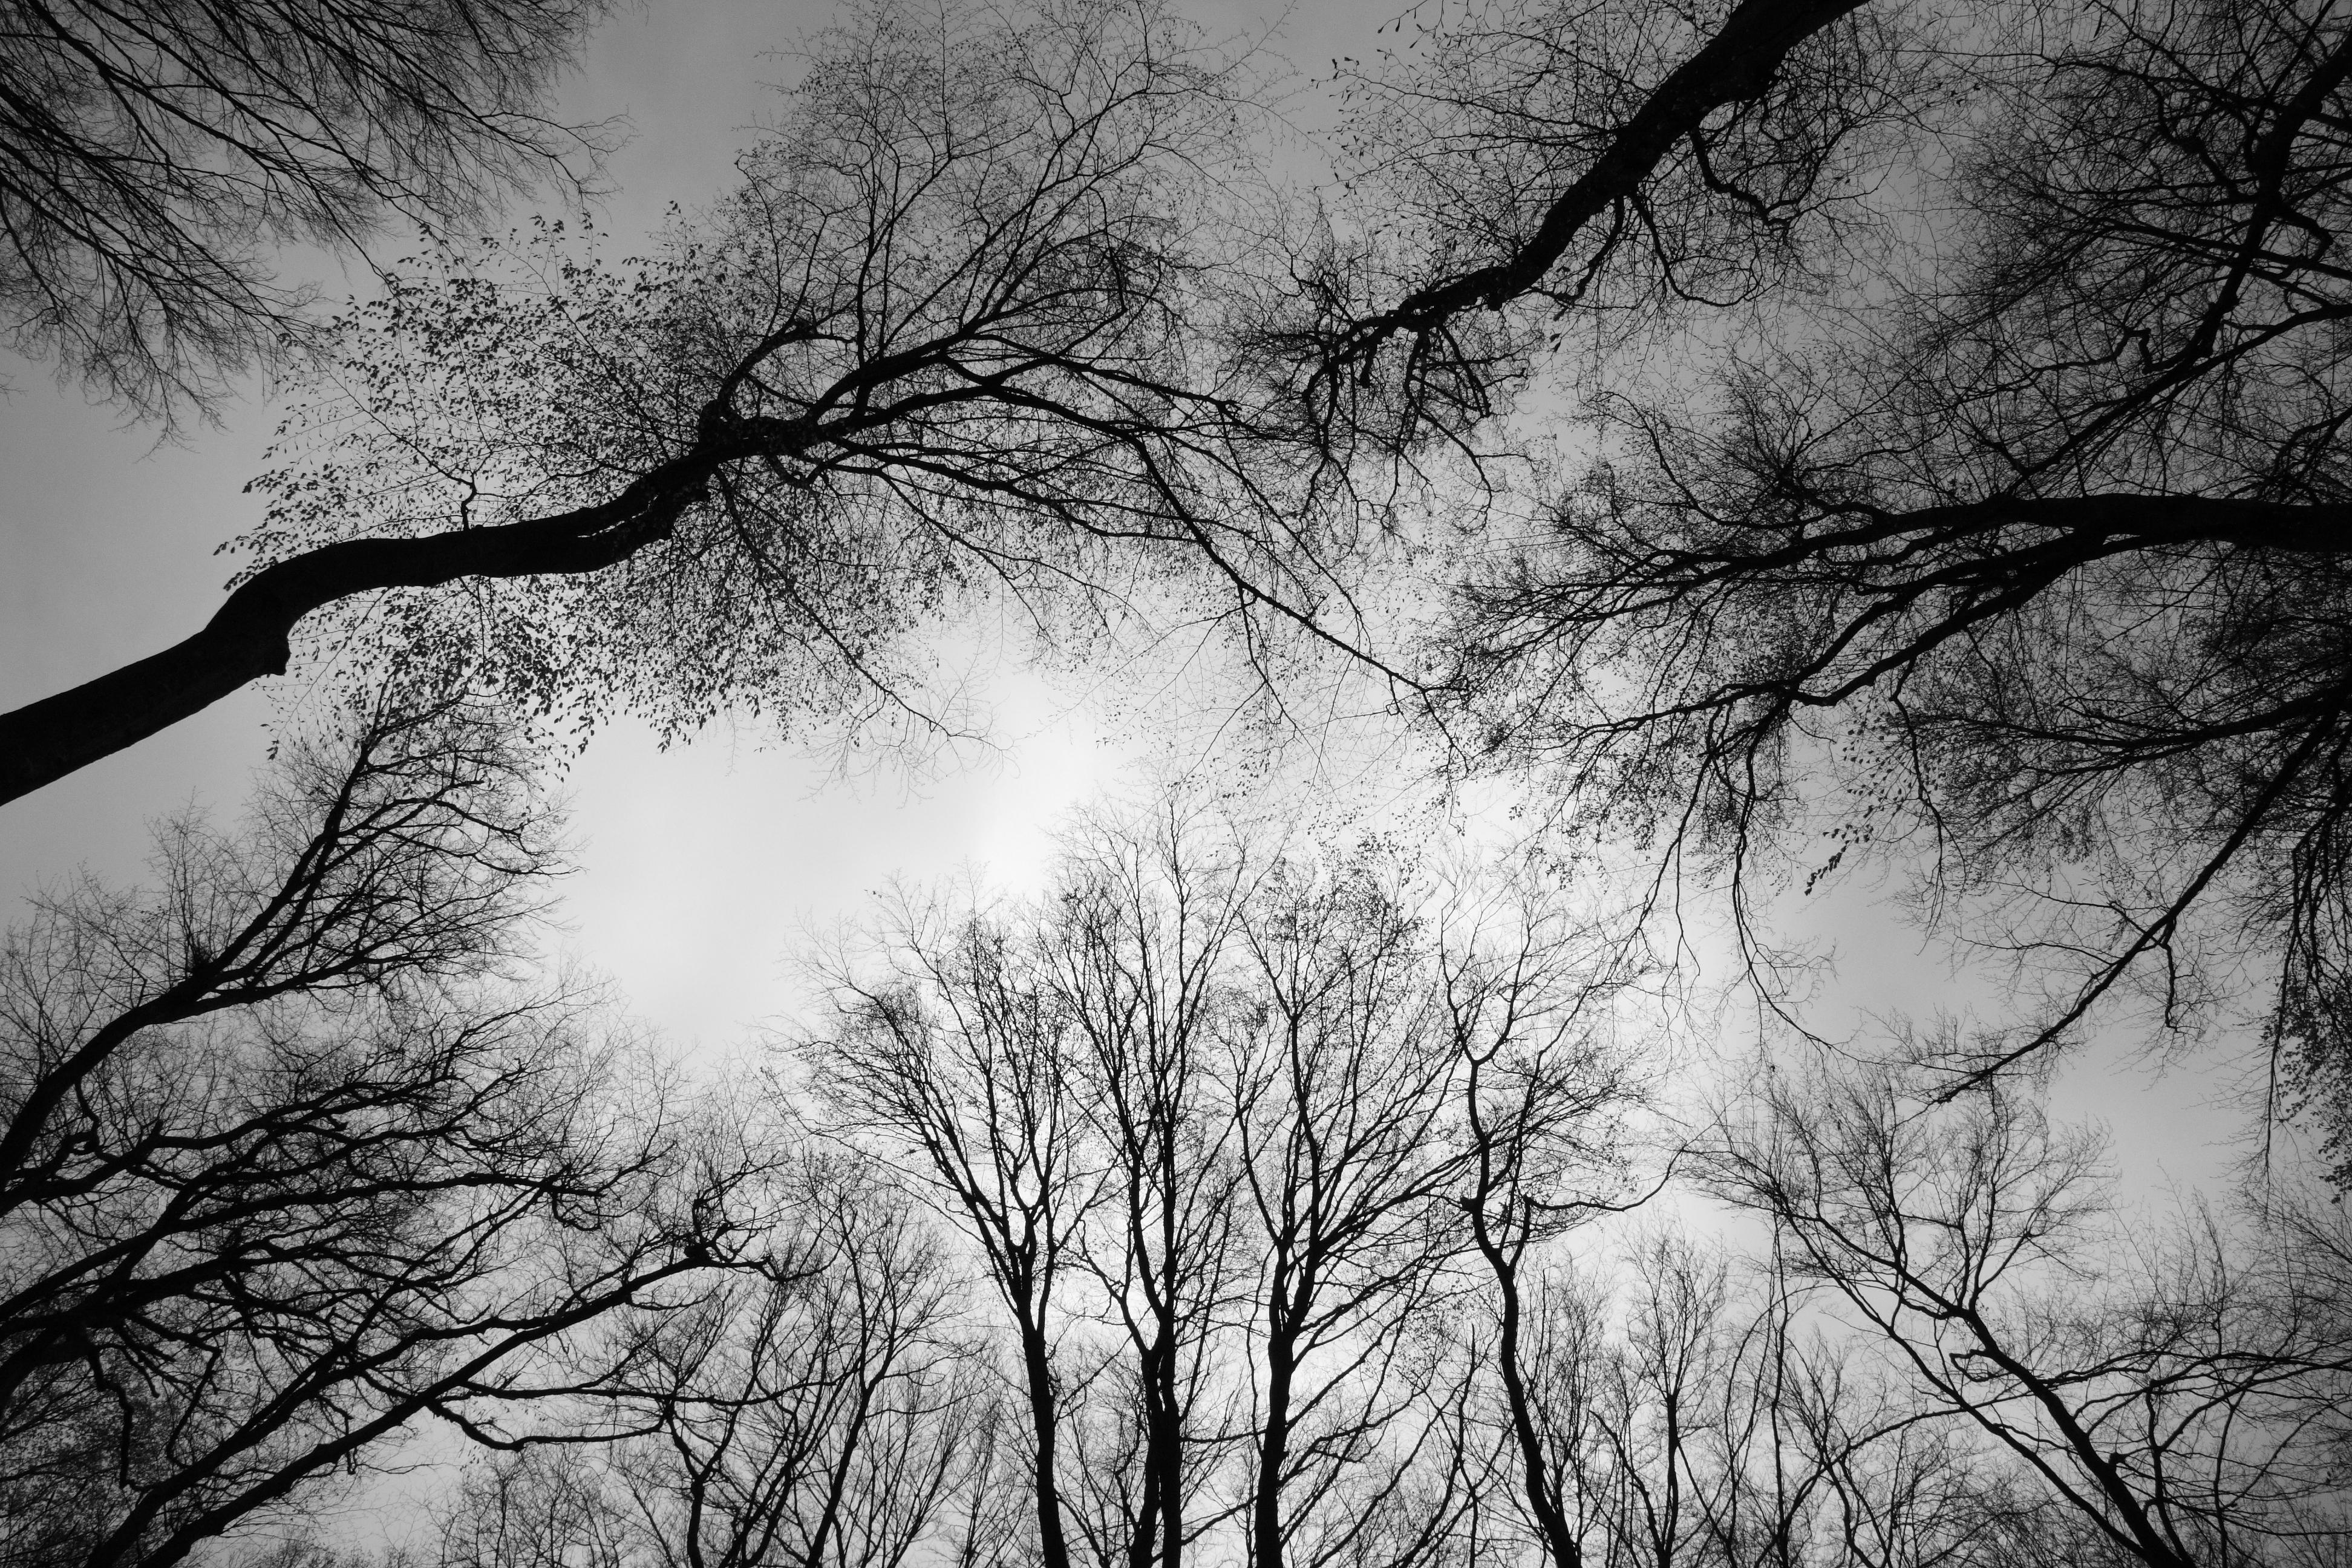 Breite_Ancient_Oak_Tree_Reserve,_Sighisoara,_Romania_(5681833966)